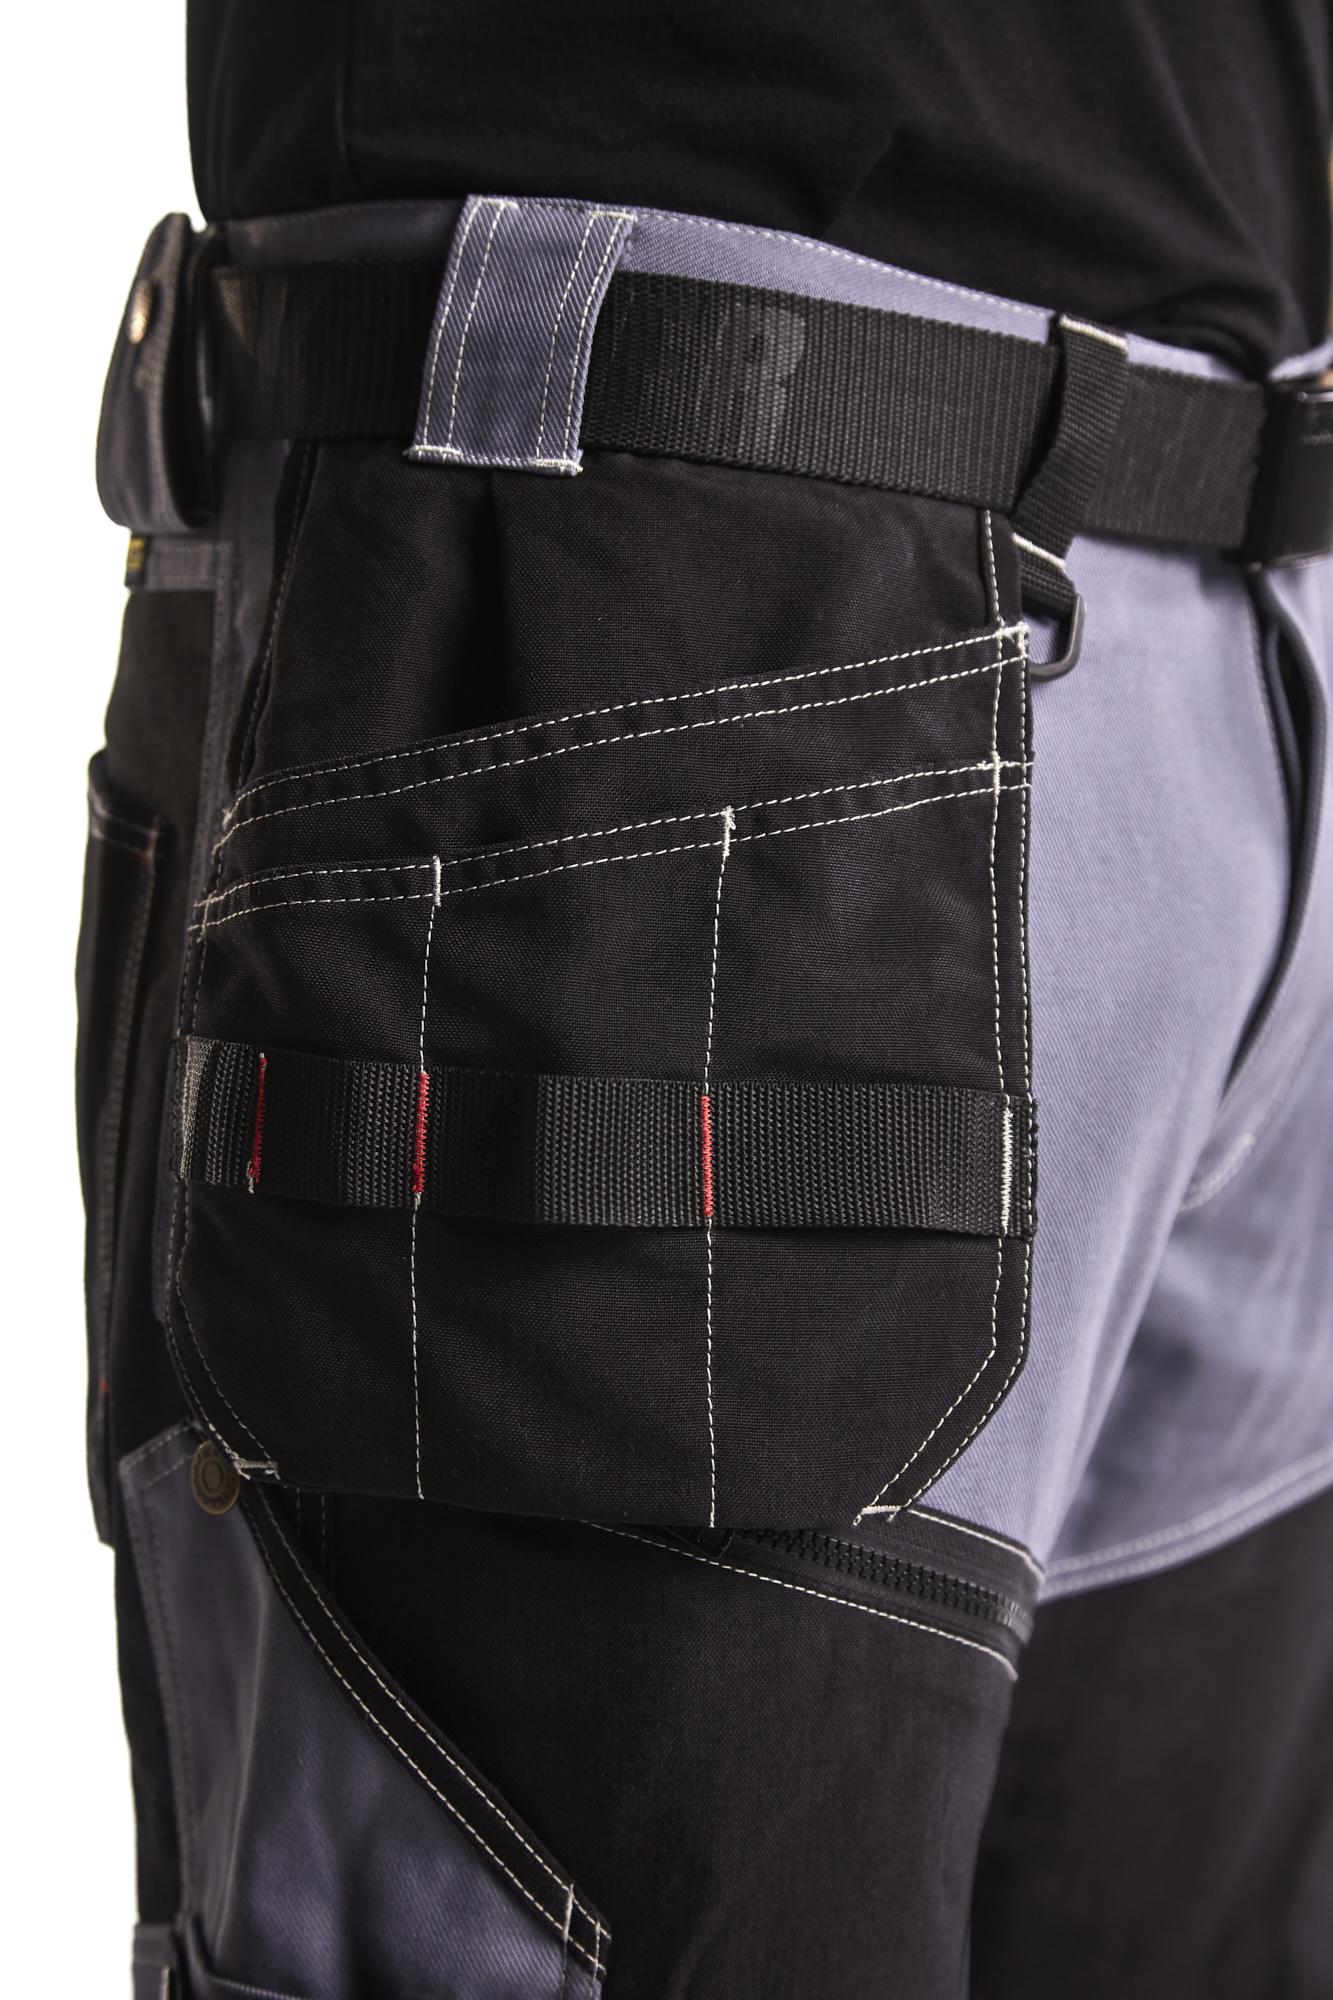 Blaklader 152518459900D108 Lightweight Craftsman Trousers Black Size 40//30